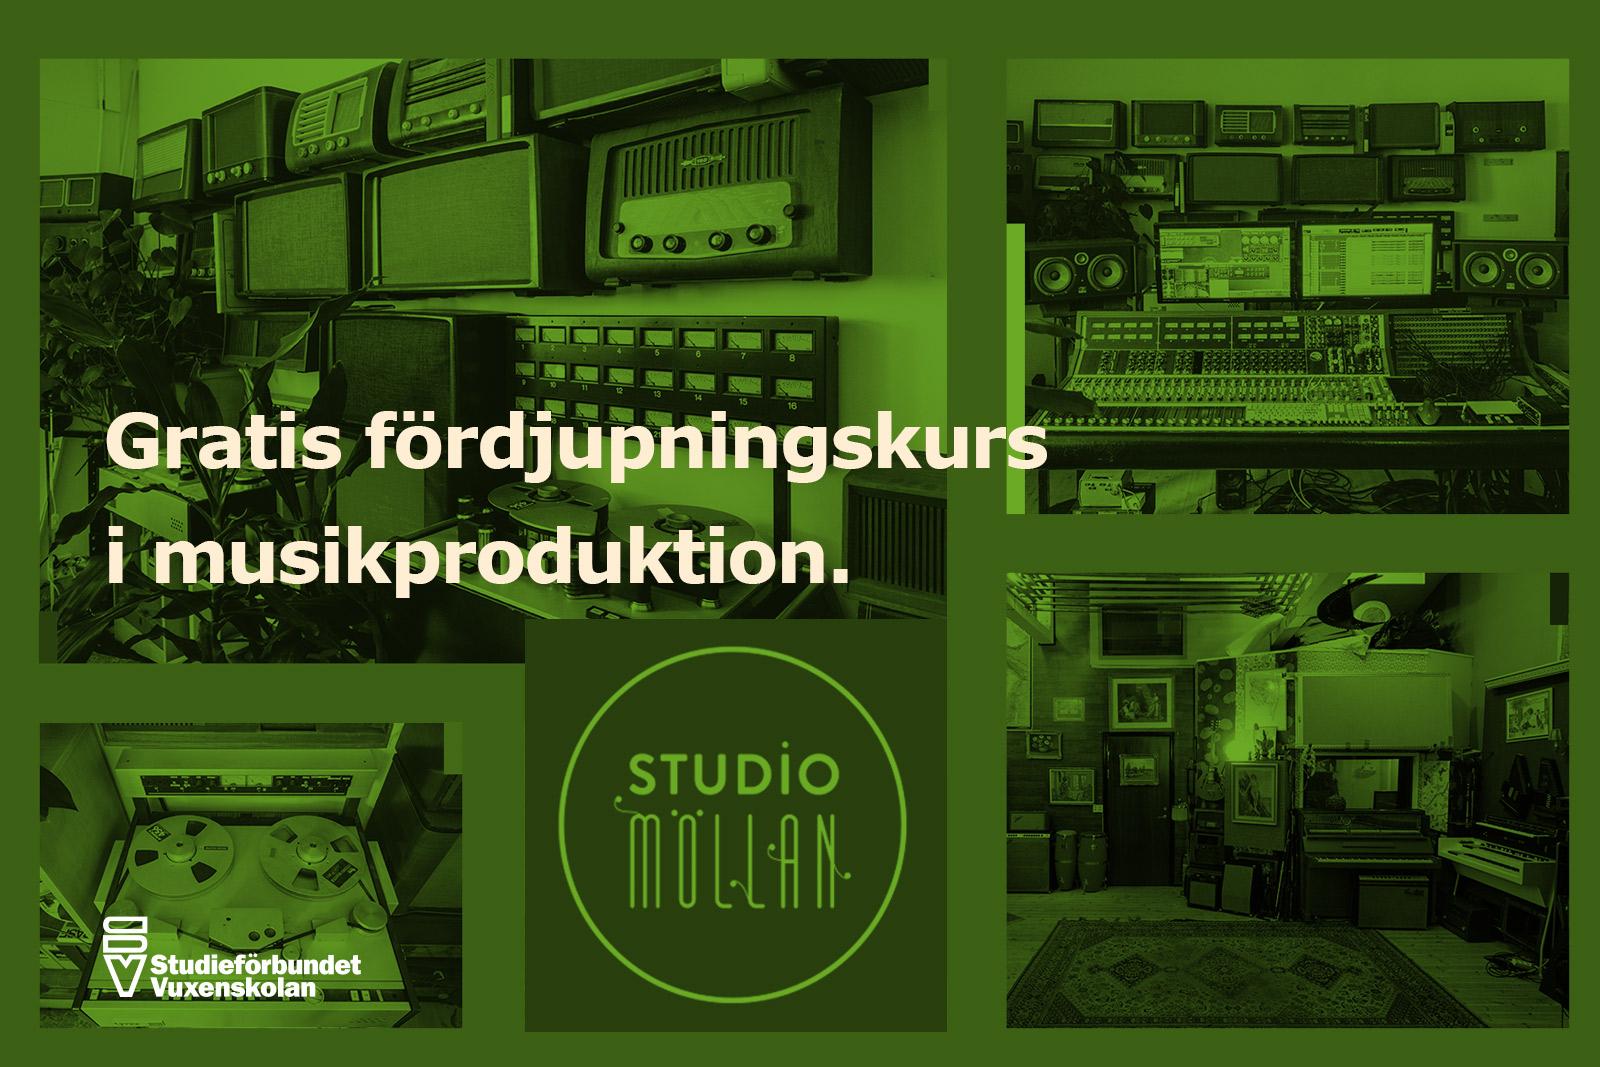 Studio möllan - gratis kurs